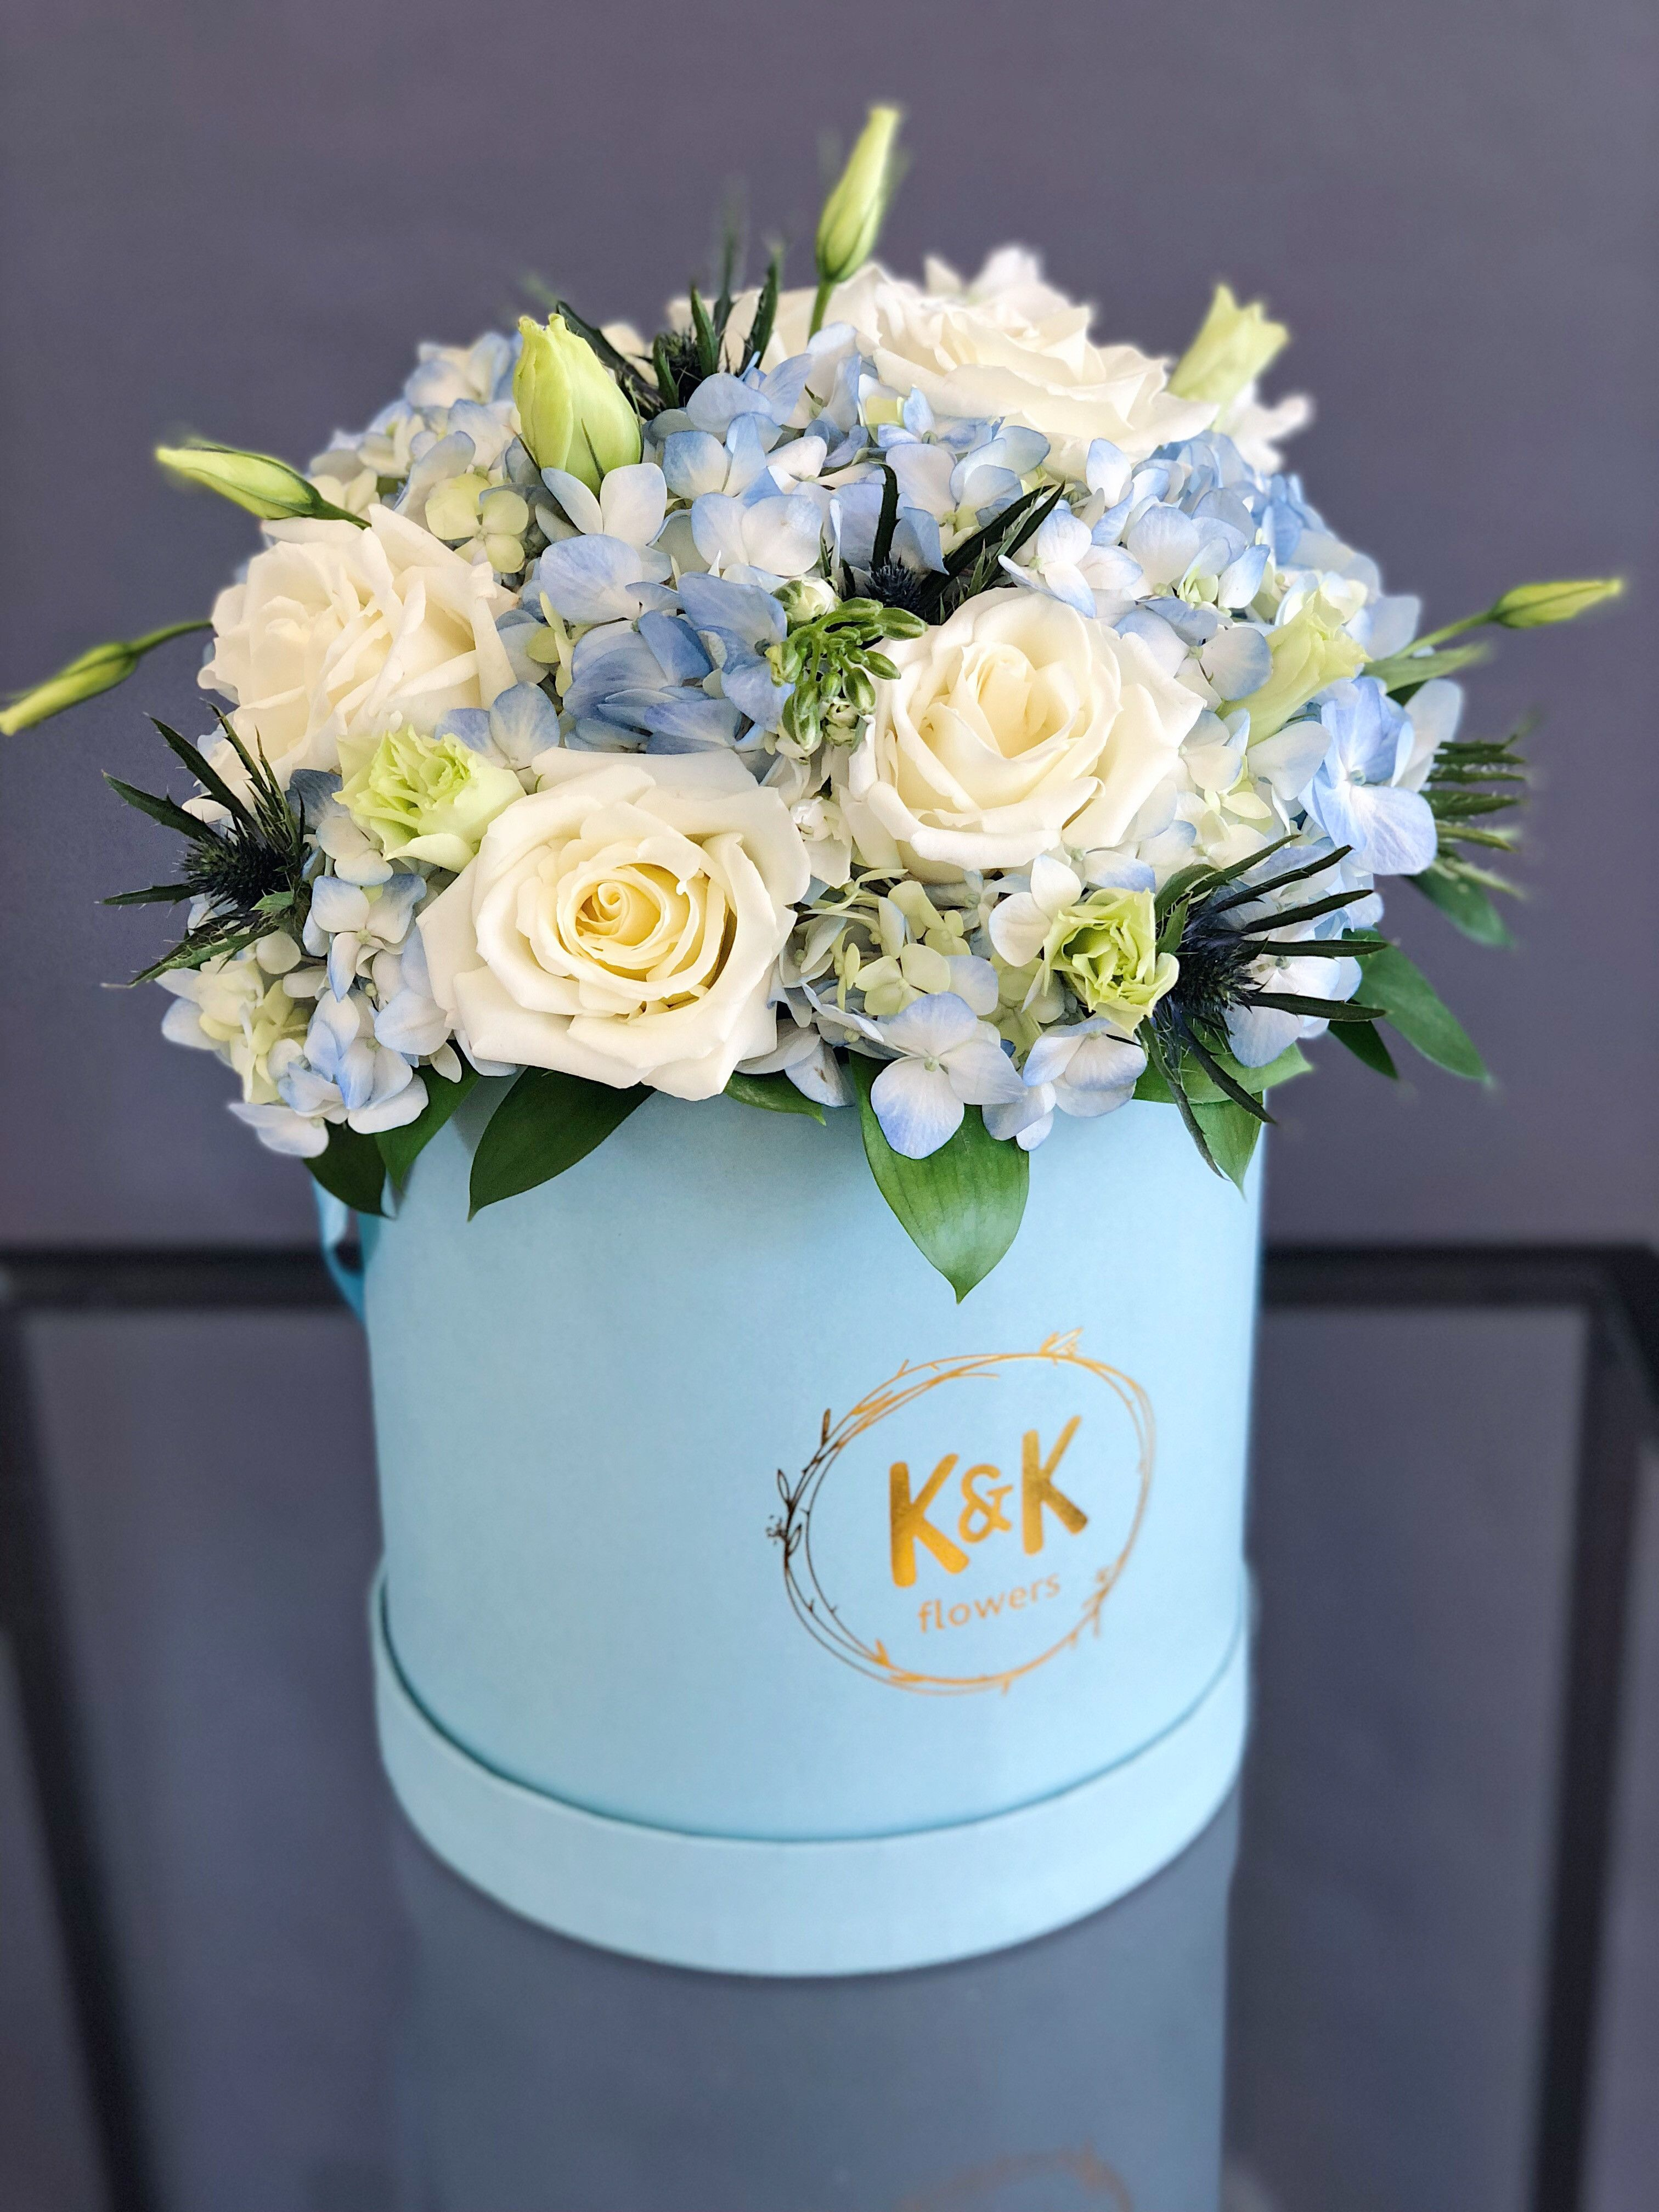 Medium blue hat box with white roses, blue hydrangeas and